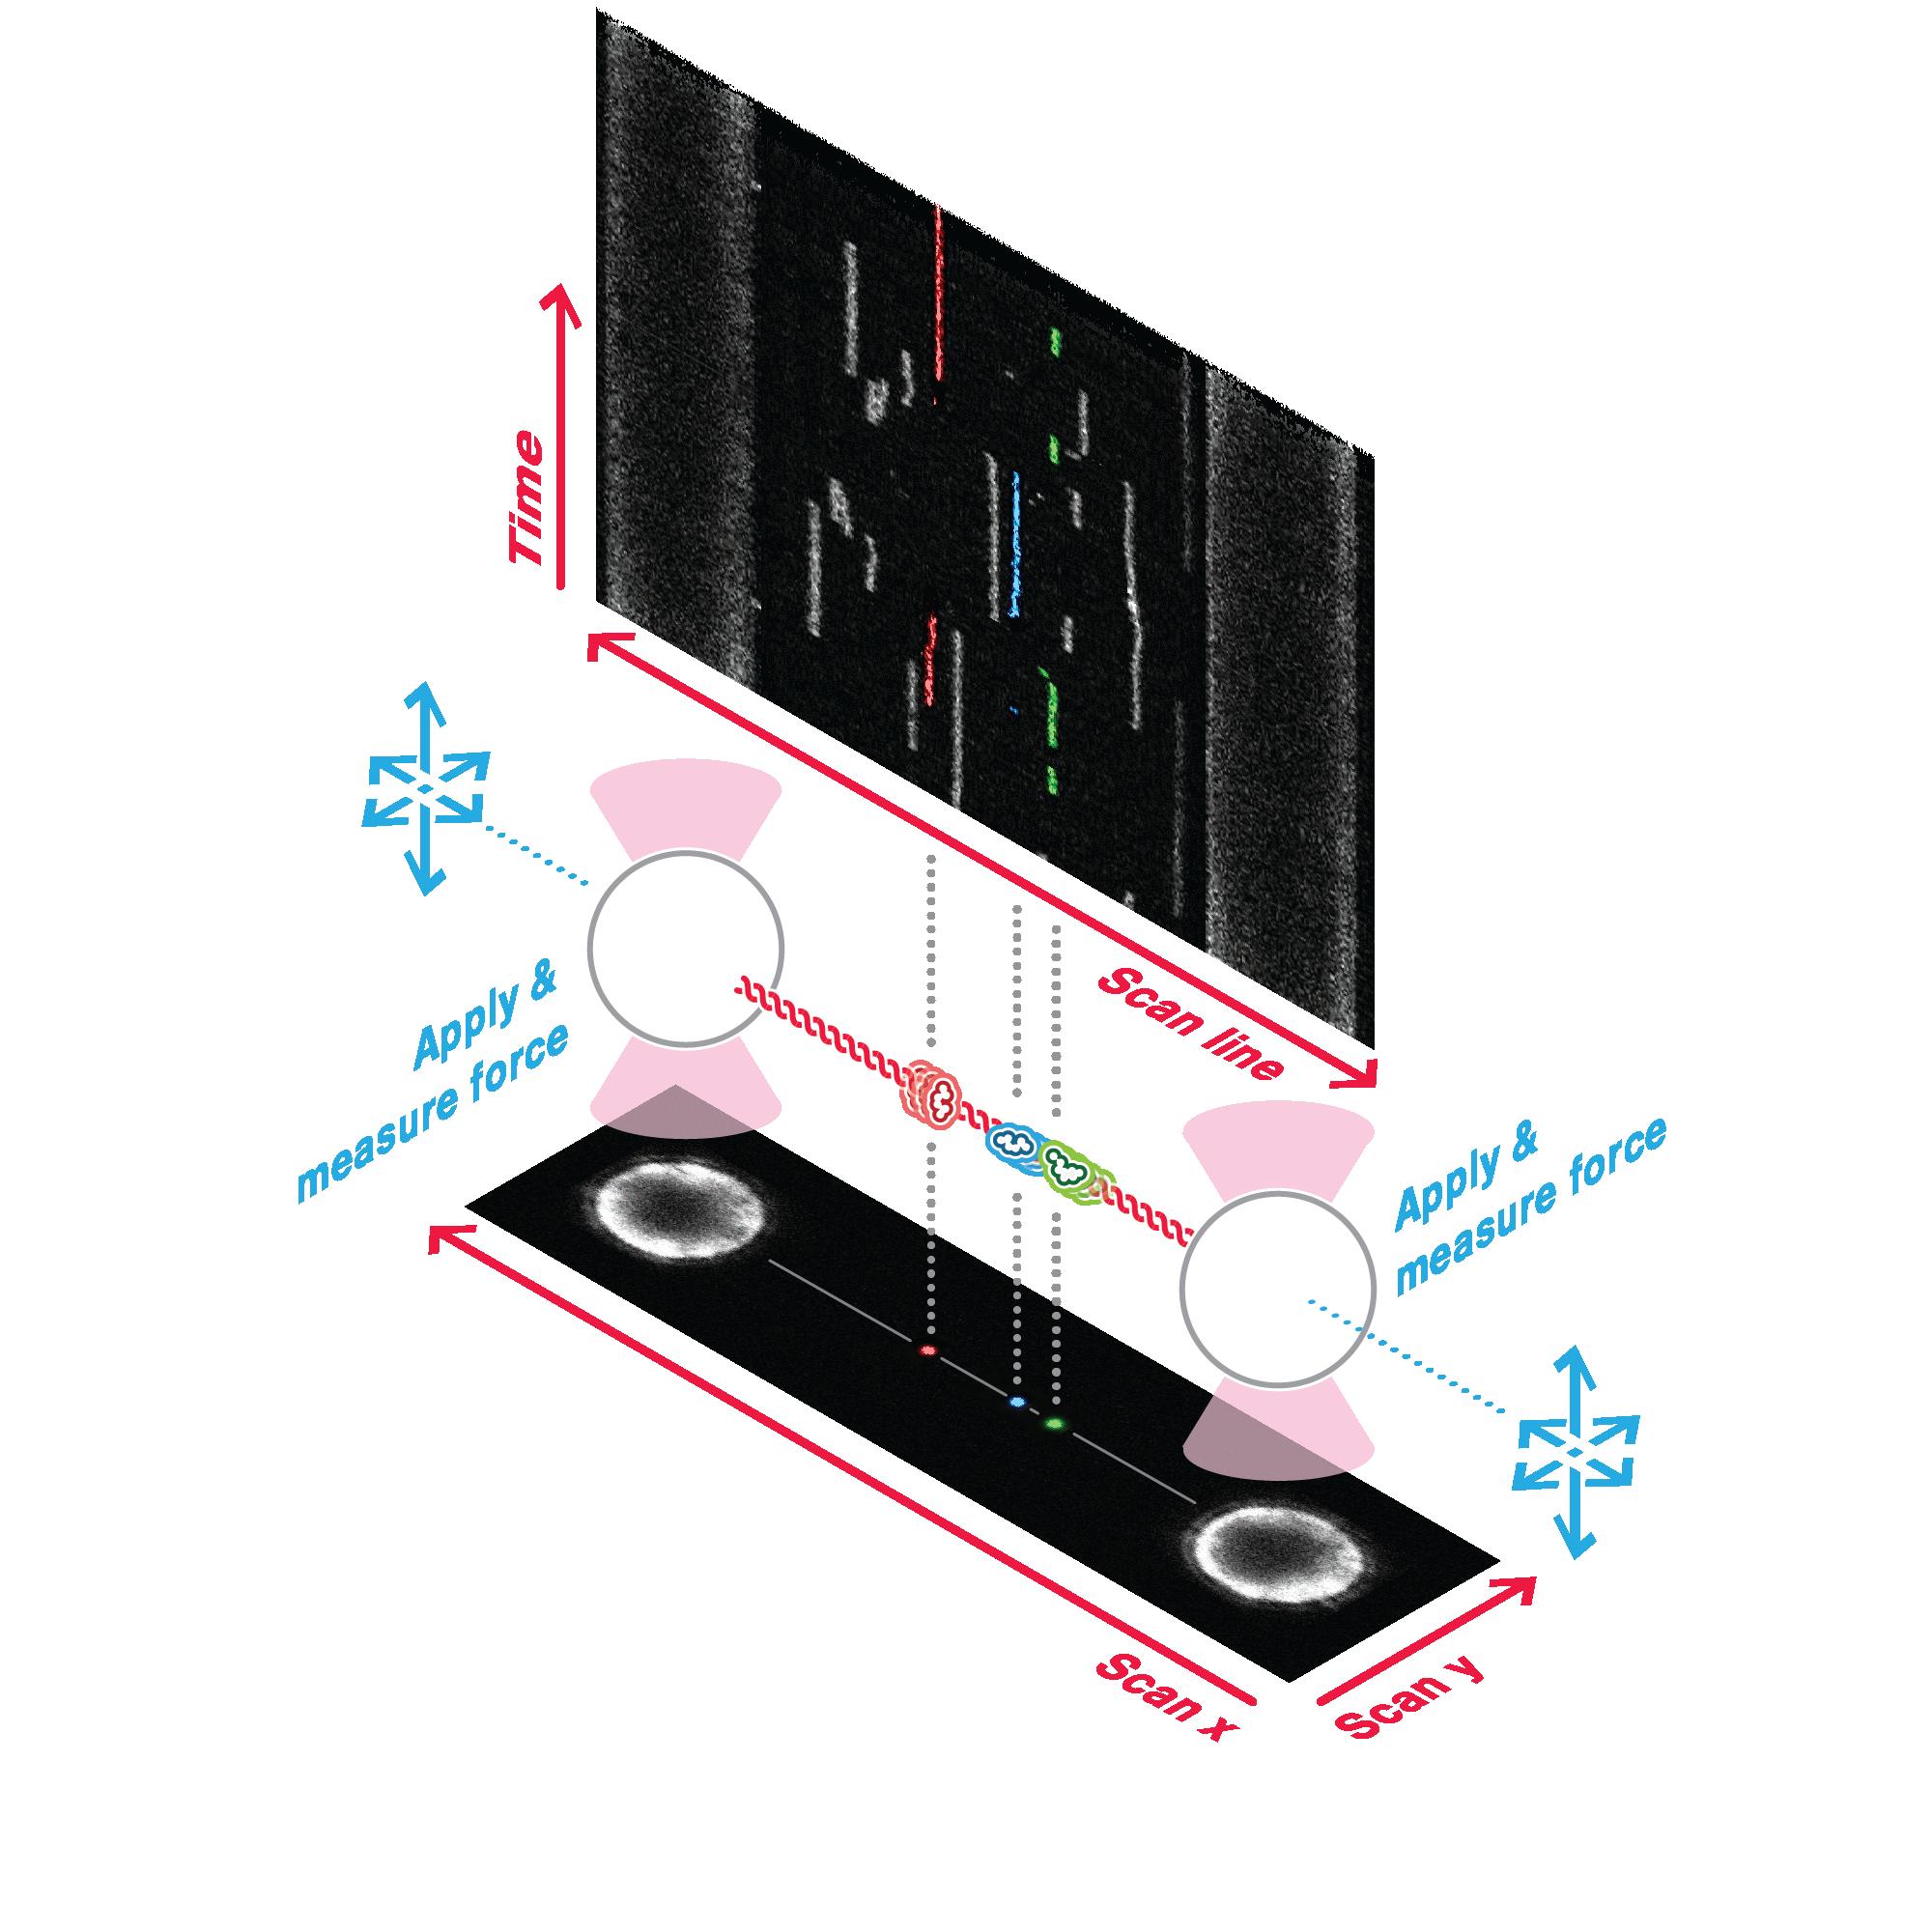 Optical Tweezers – Fluorescence Microscopy